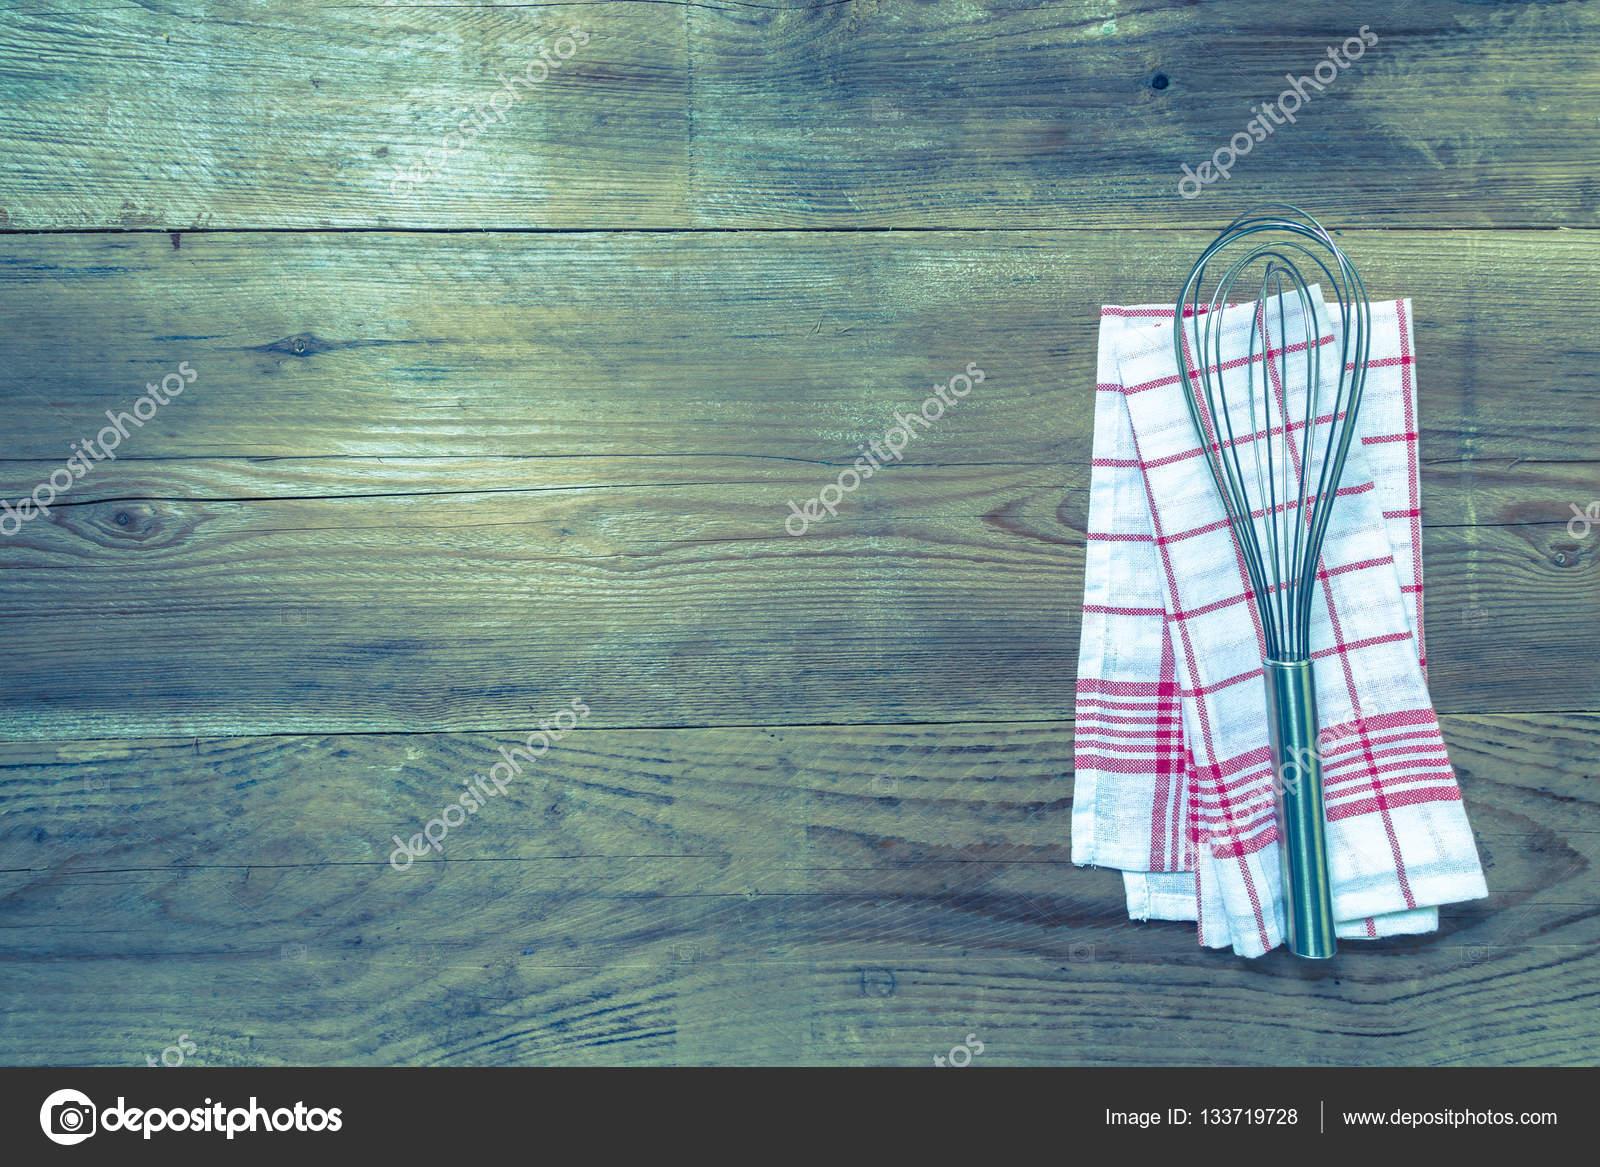 kitchen whisk aid superba 用拂尘木木材背景上的红色厨房巾 图库照片 c 8vfandp 133719728